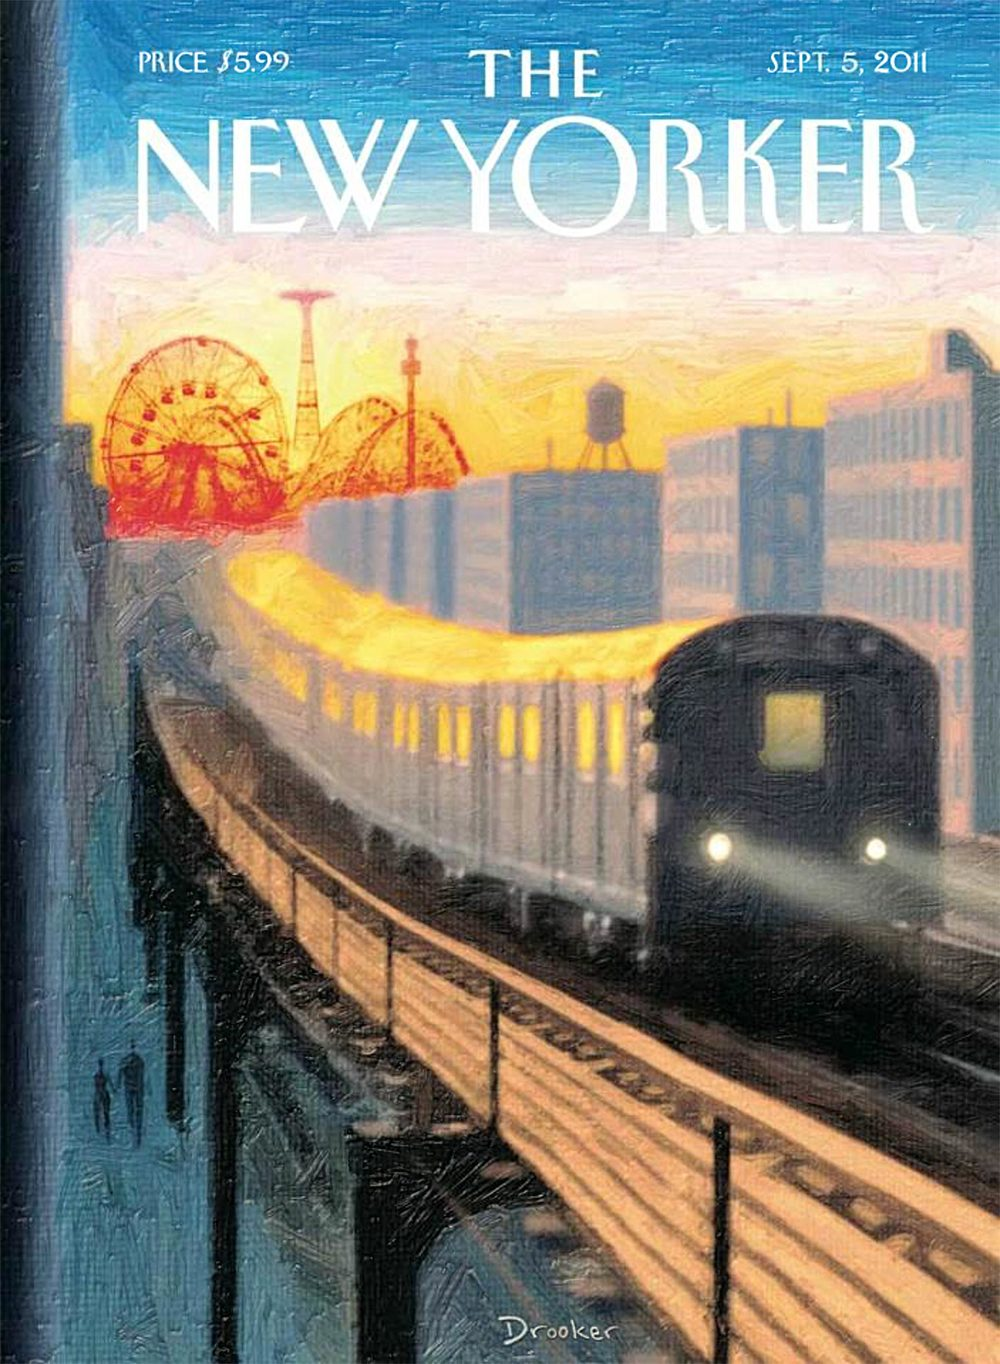 Coney Island Express